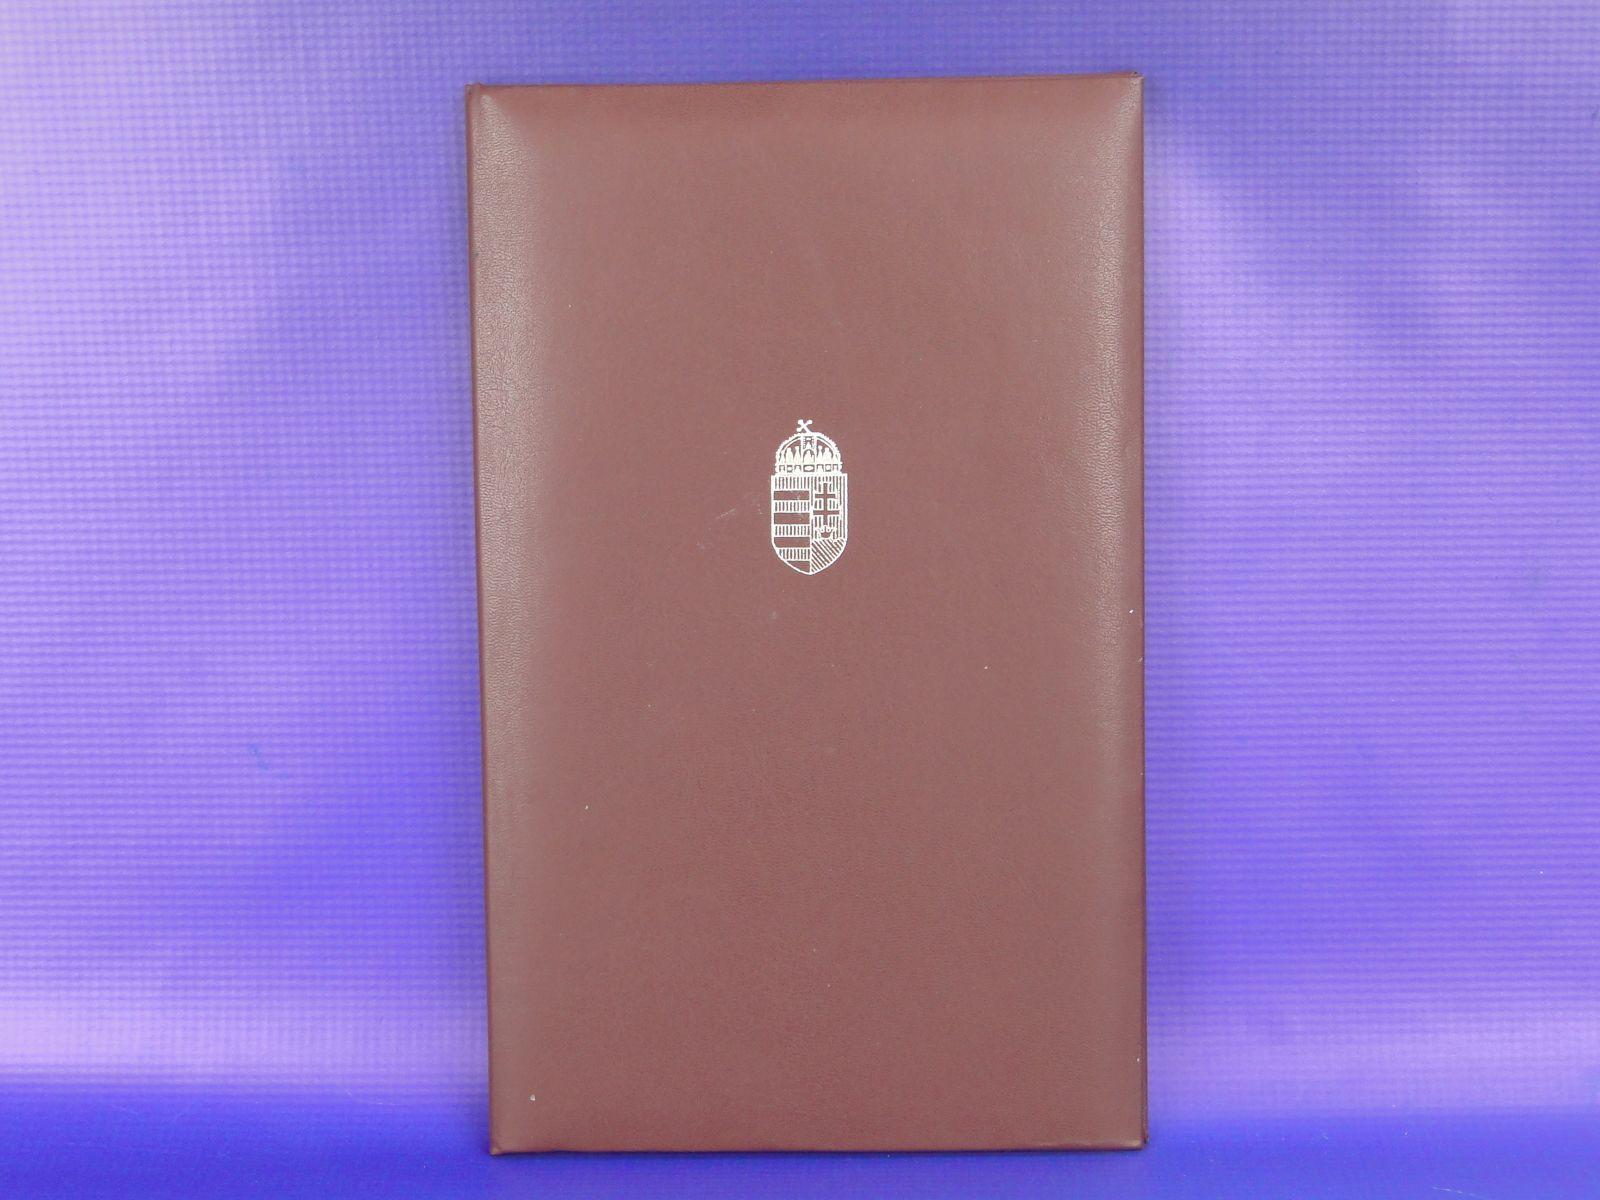 DSC06699.JPG (1600×1200)